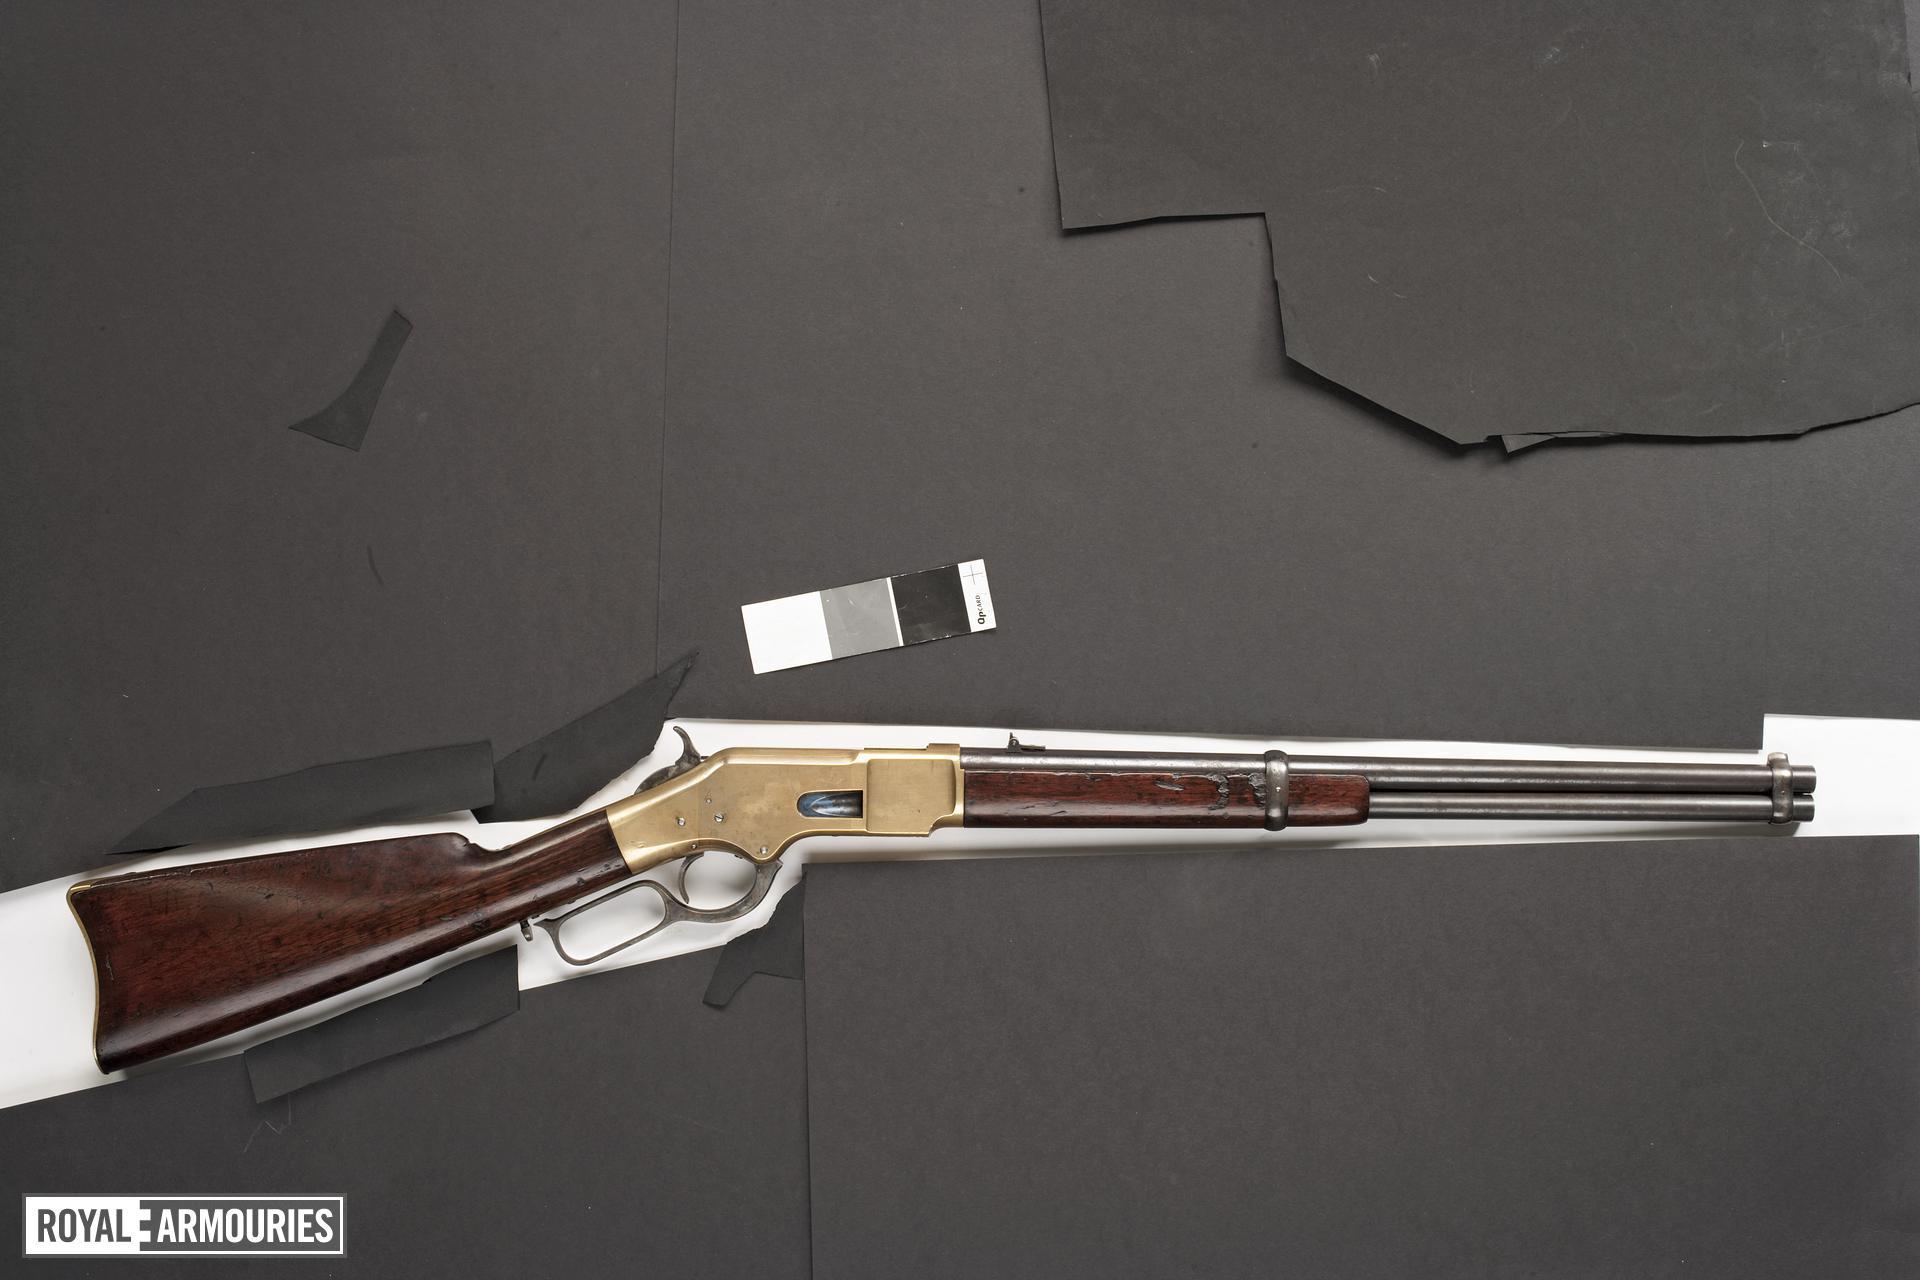 Rimfire lever-action rifle - Winchester Model 1866